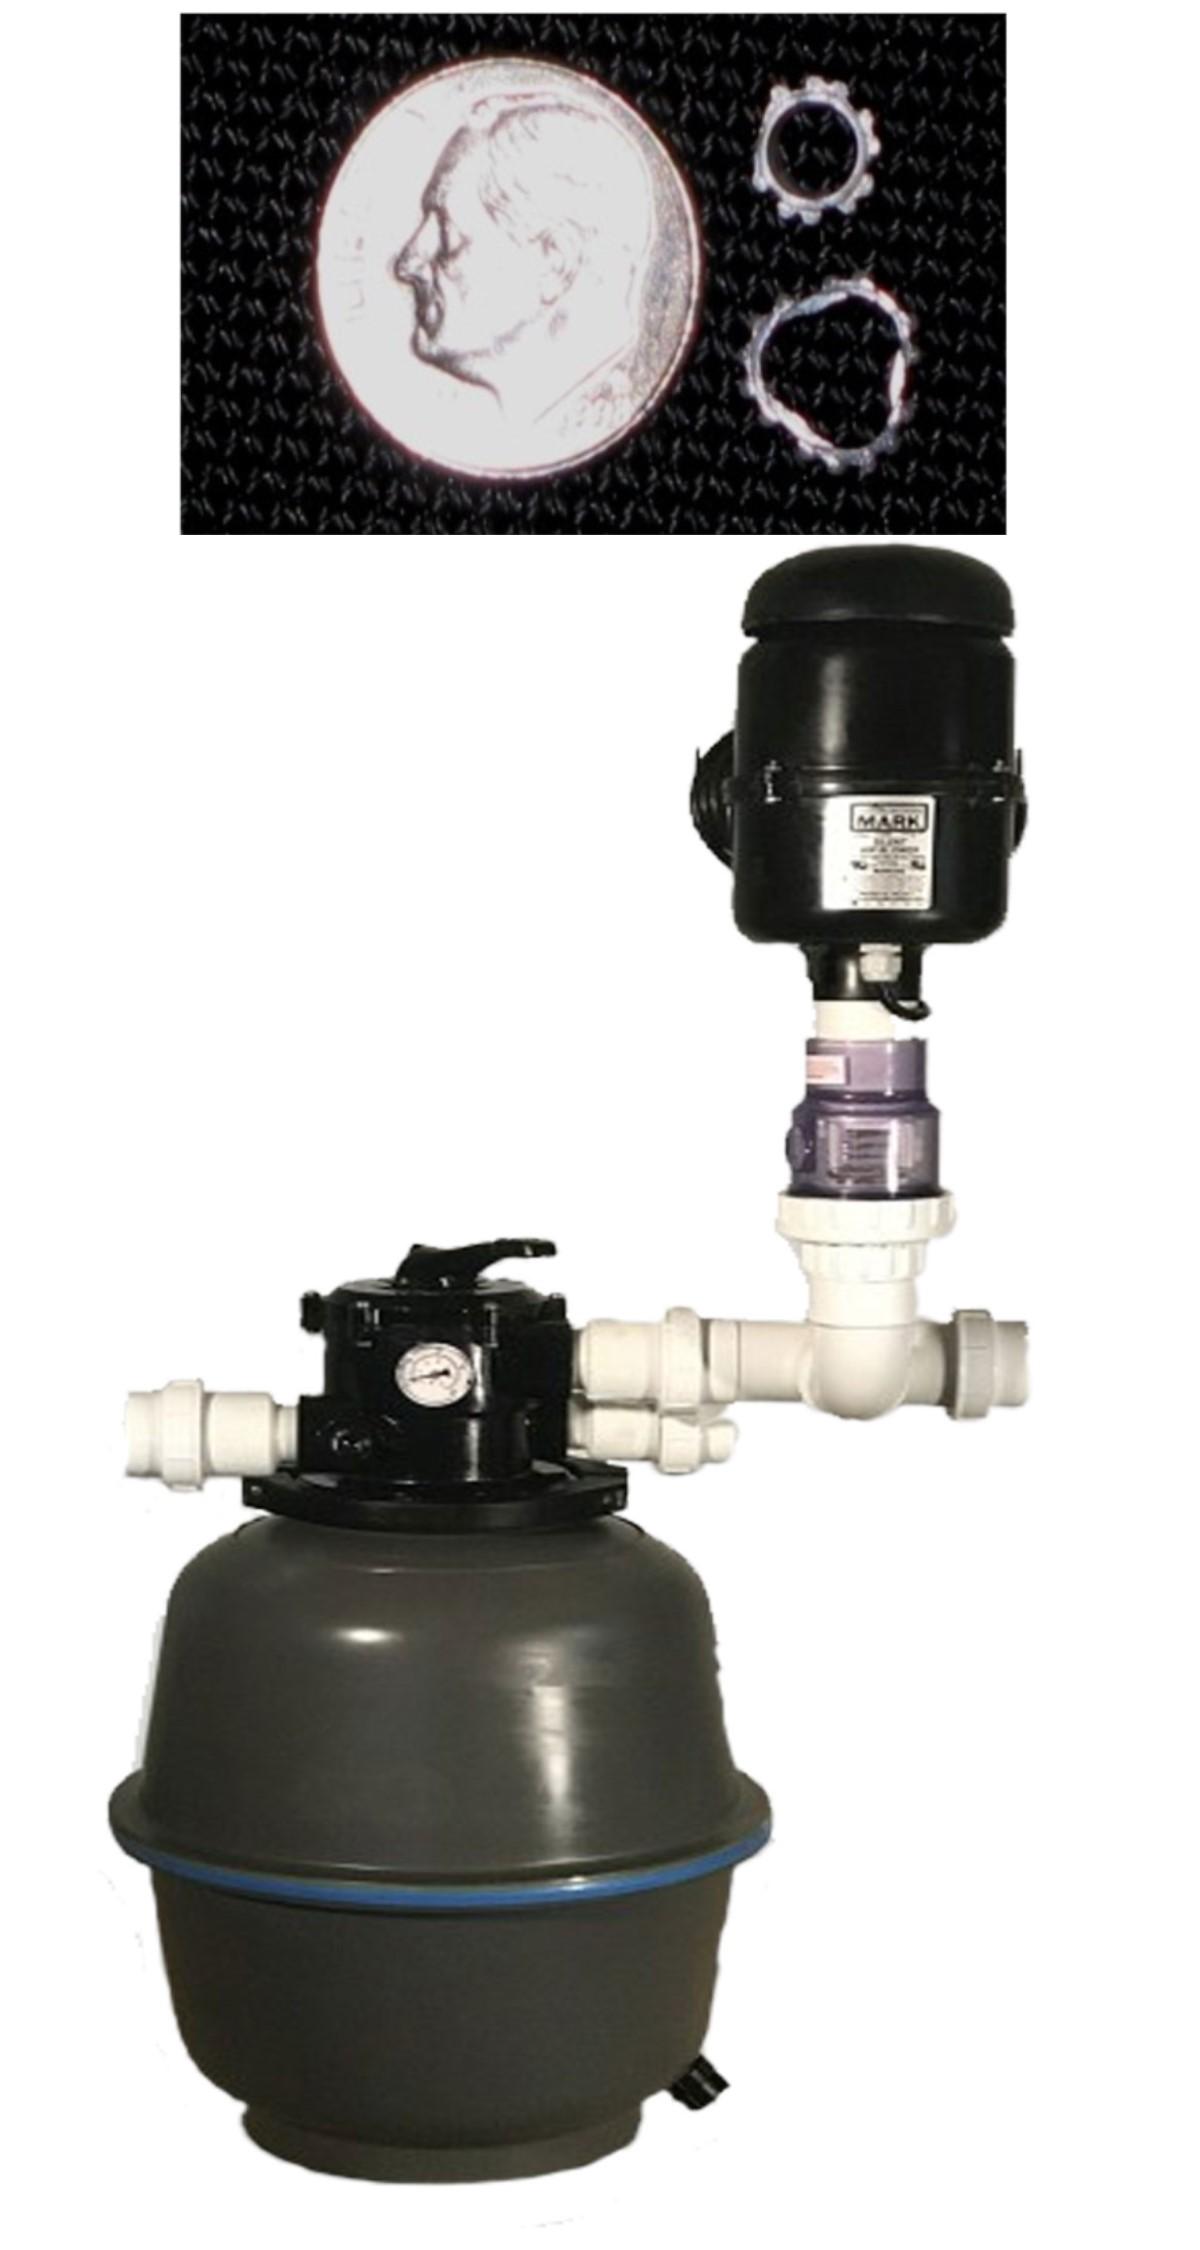 GCTek PondKeeper 1.75 Pond Filter